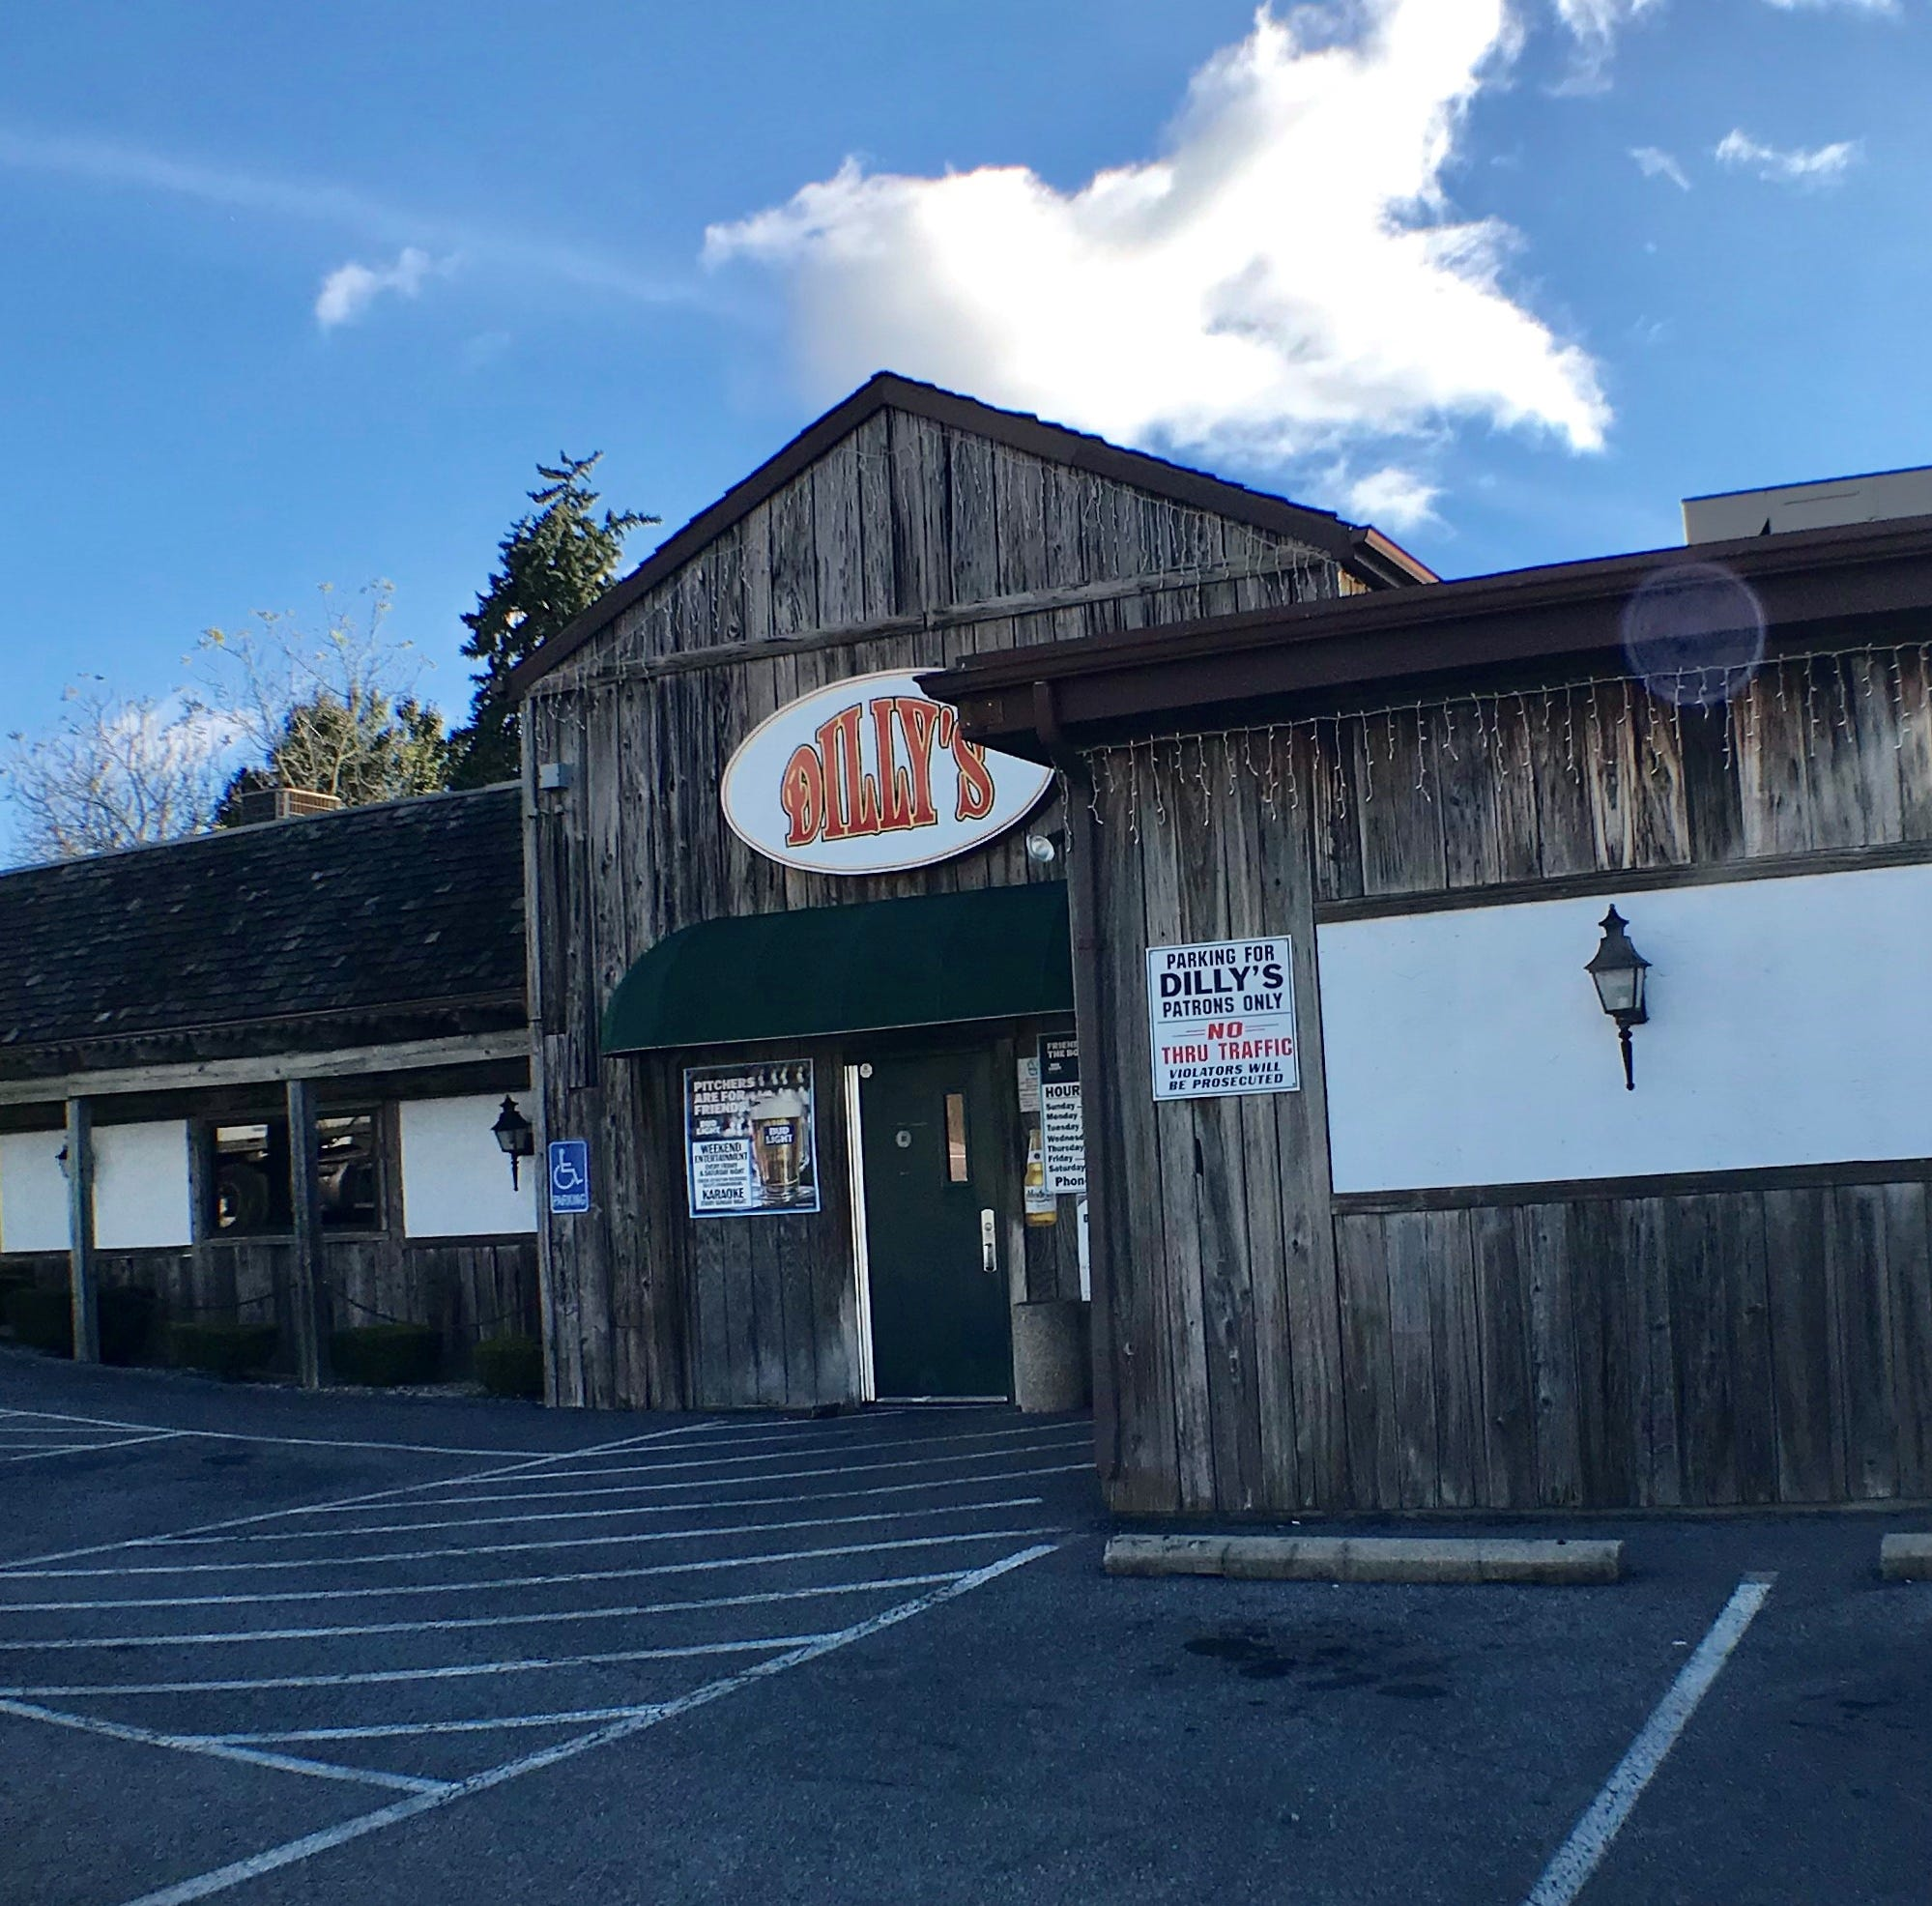 Chambersburg restaurant Dilly's will close